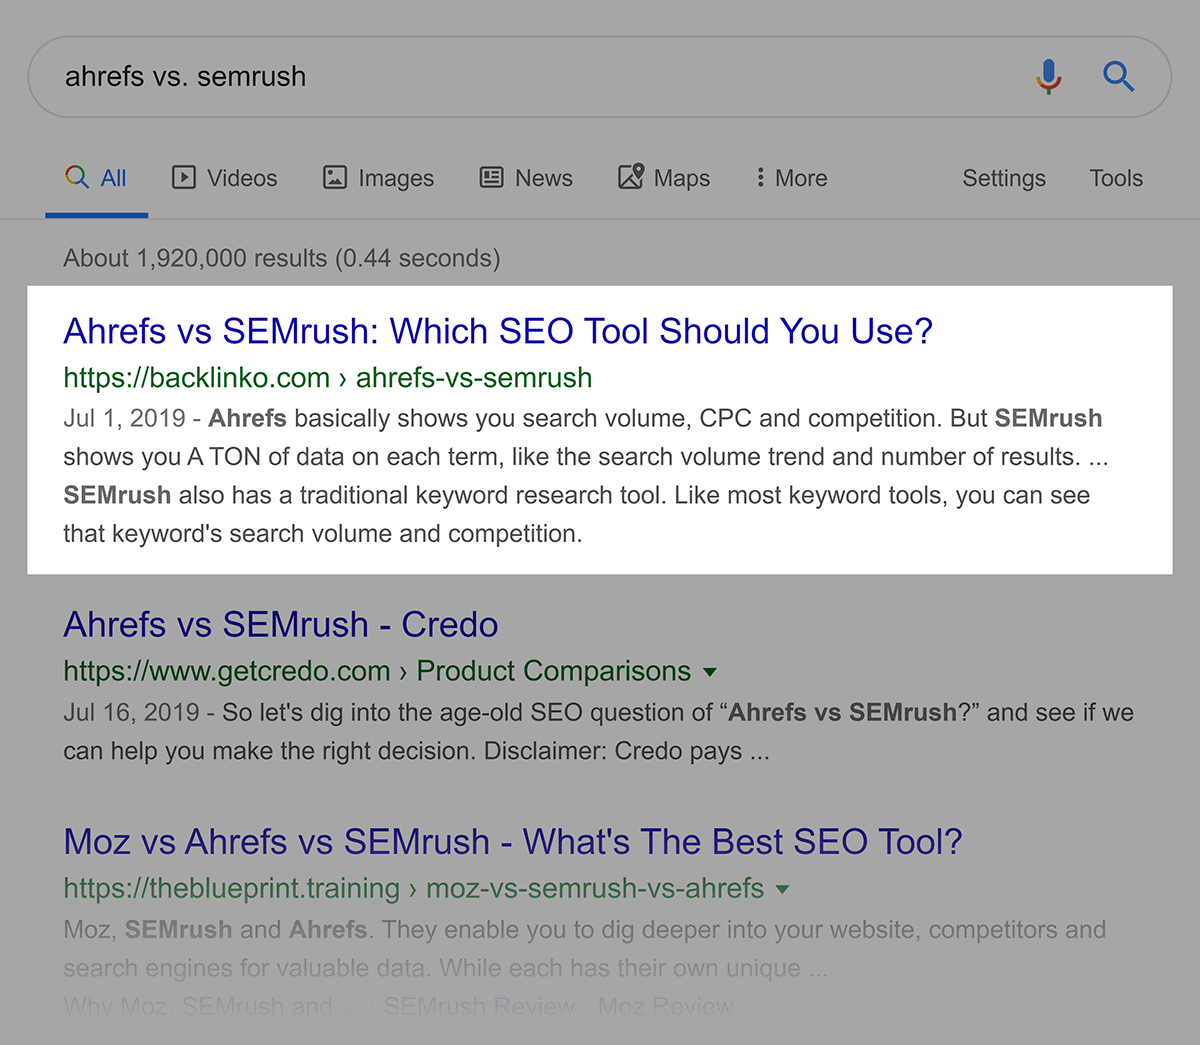 Ahrefs Vs SemRush Google SERP